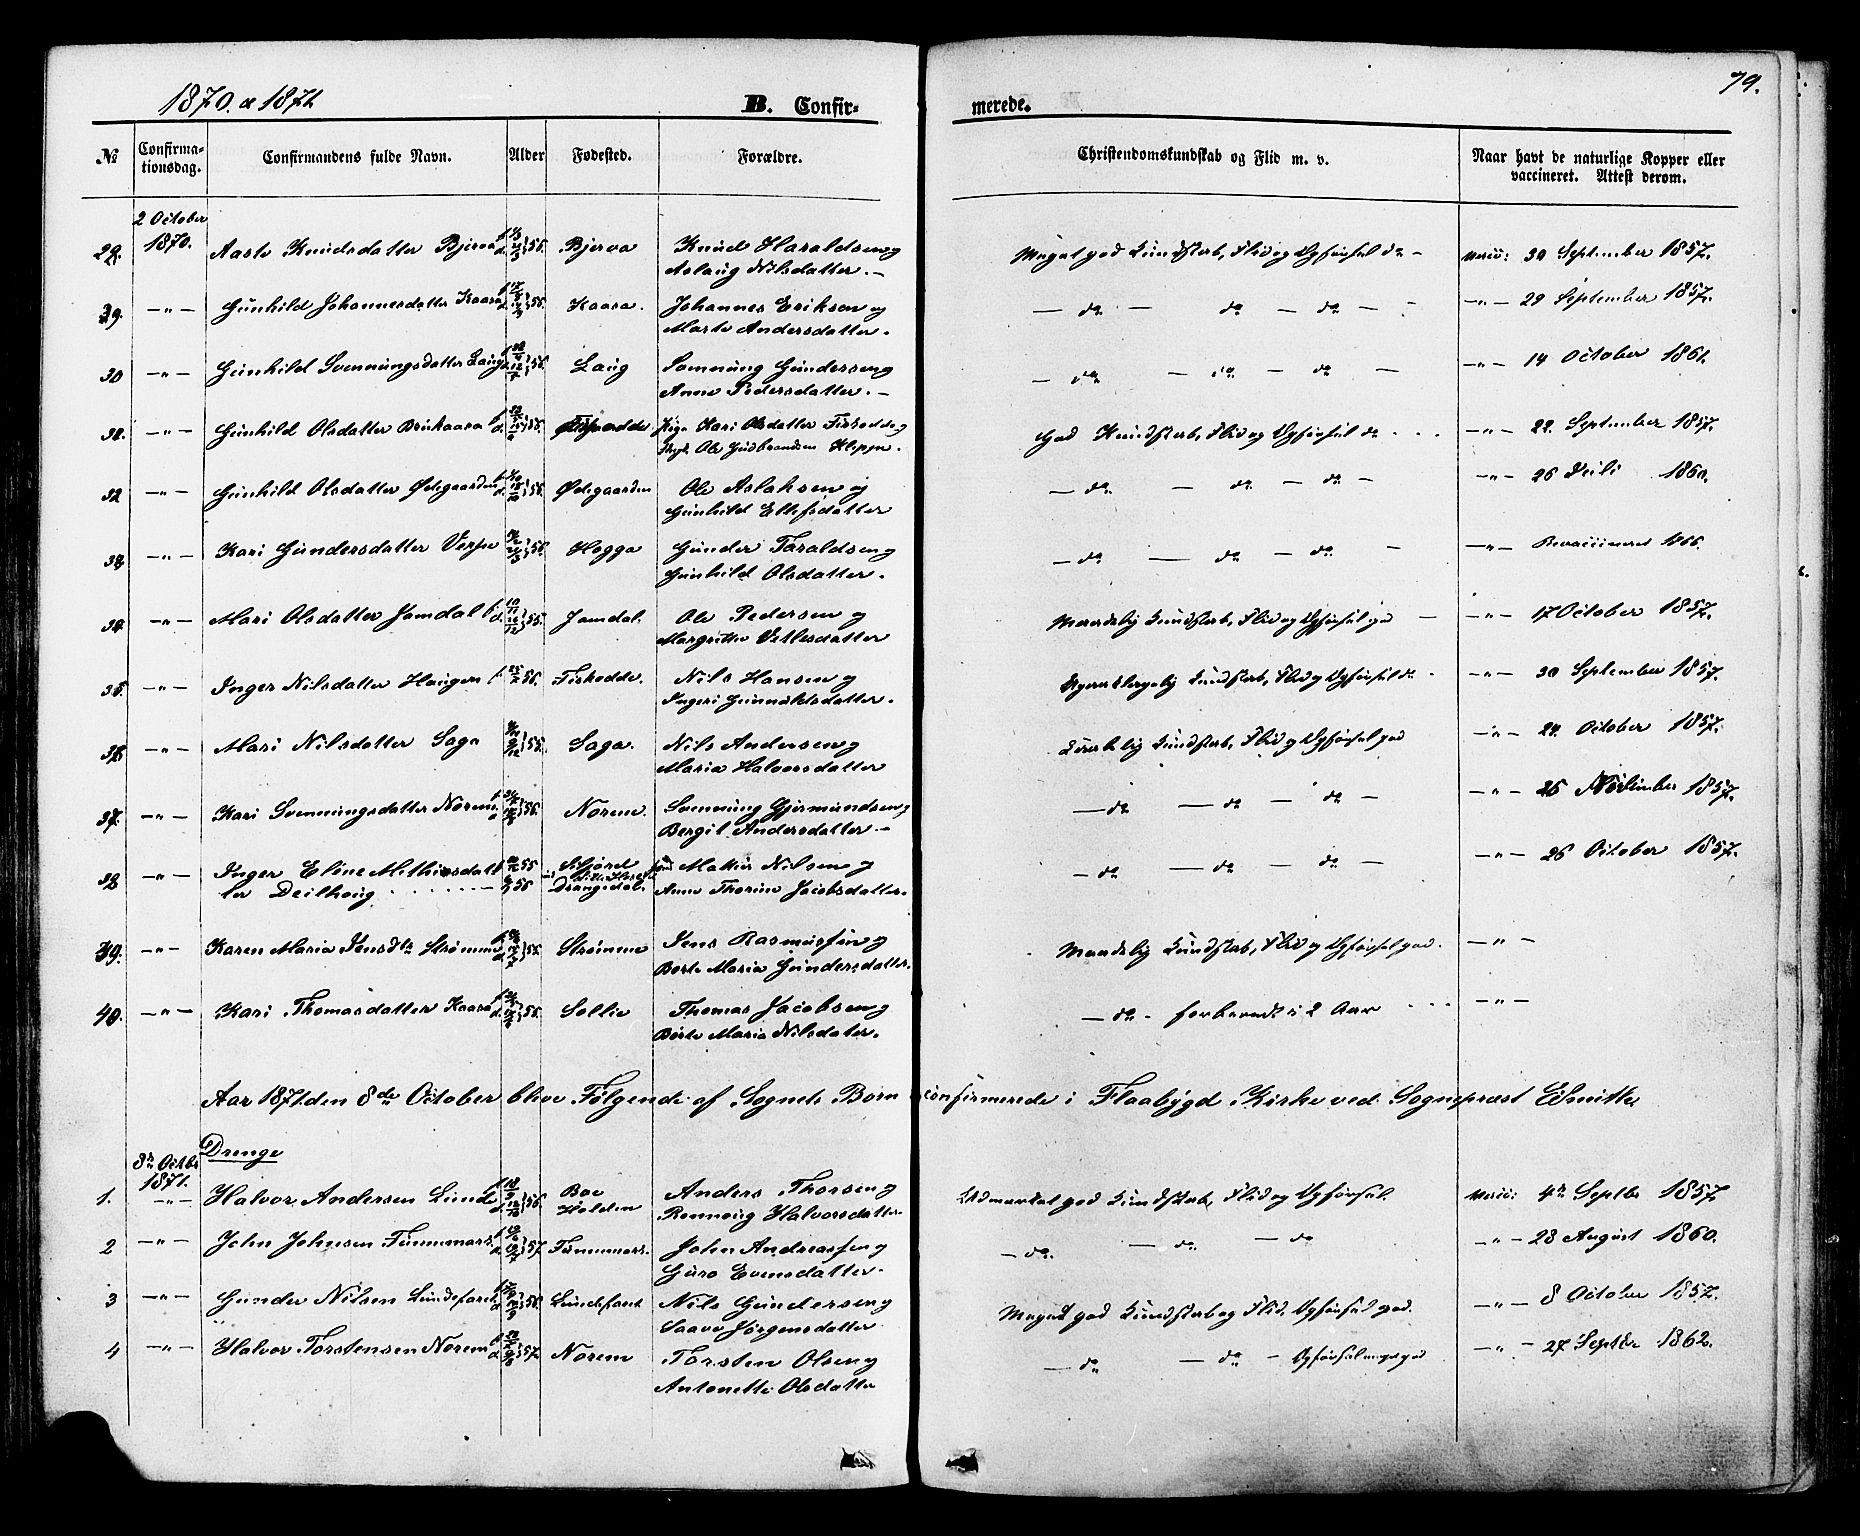 SAKO, Lunde kirkebøker, F/Fa/L0001: Ministerialbok nr. I 1, 1866-1883, s. 79